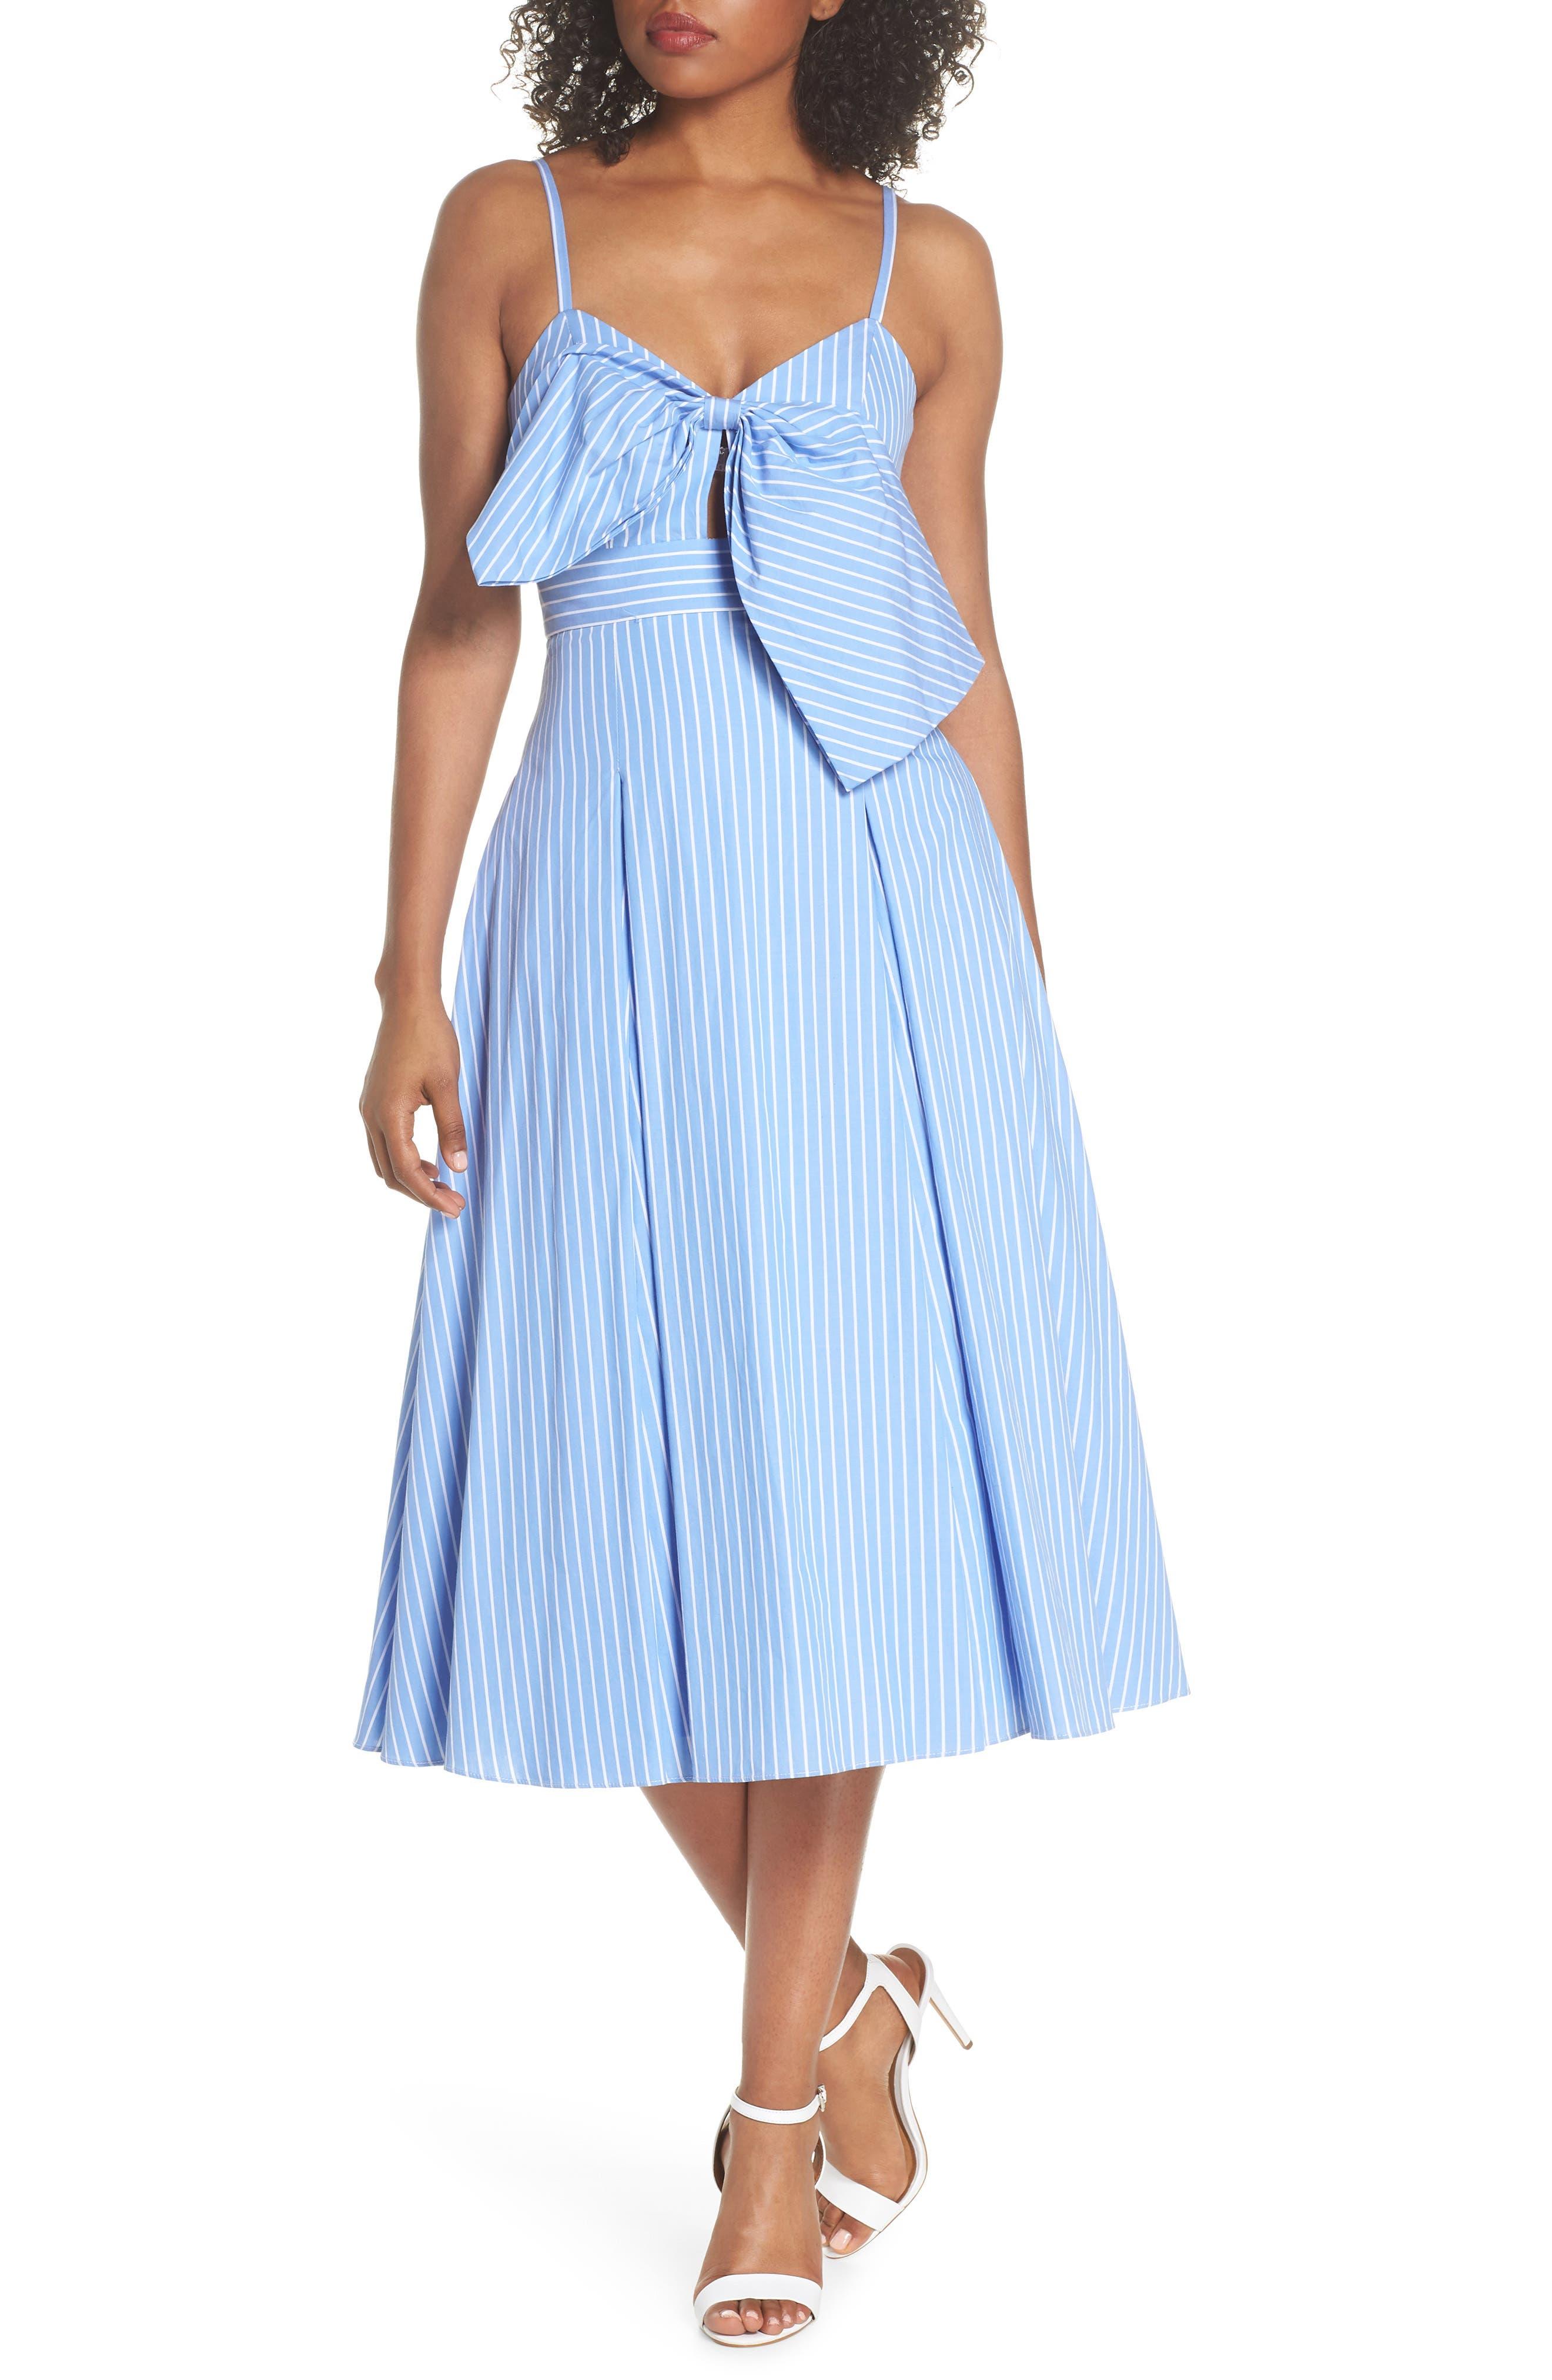 Becky Bow Front Tea Length Dress,                             Main thumbnail 1, color,                             450